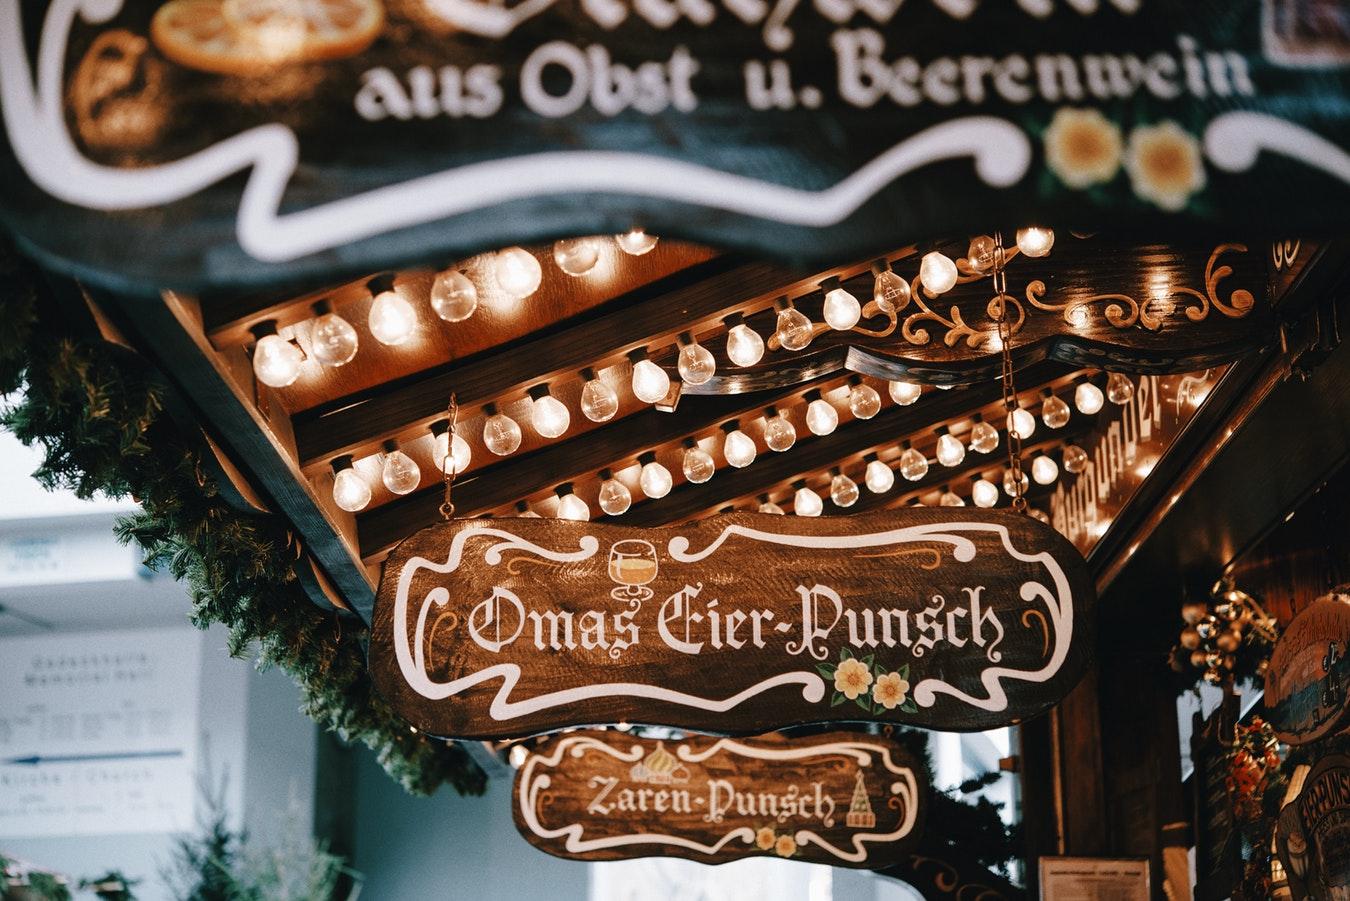 Oktoberfest Decorations and Signage